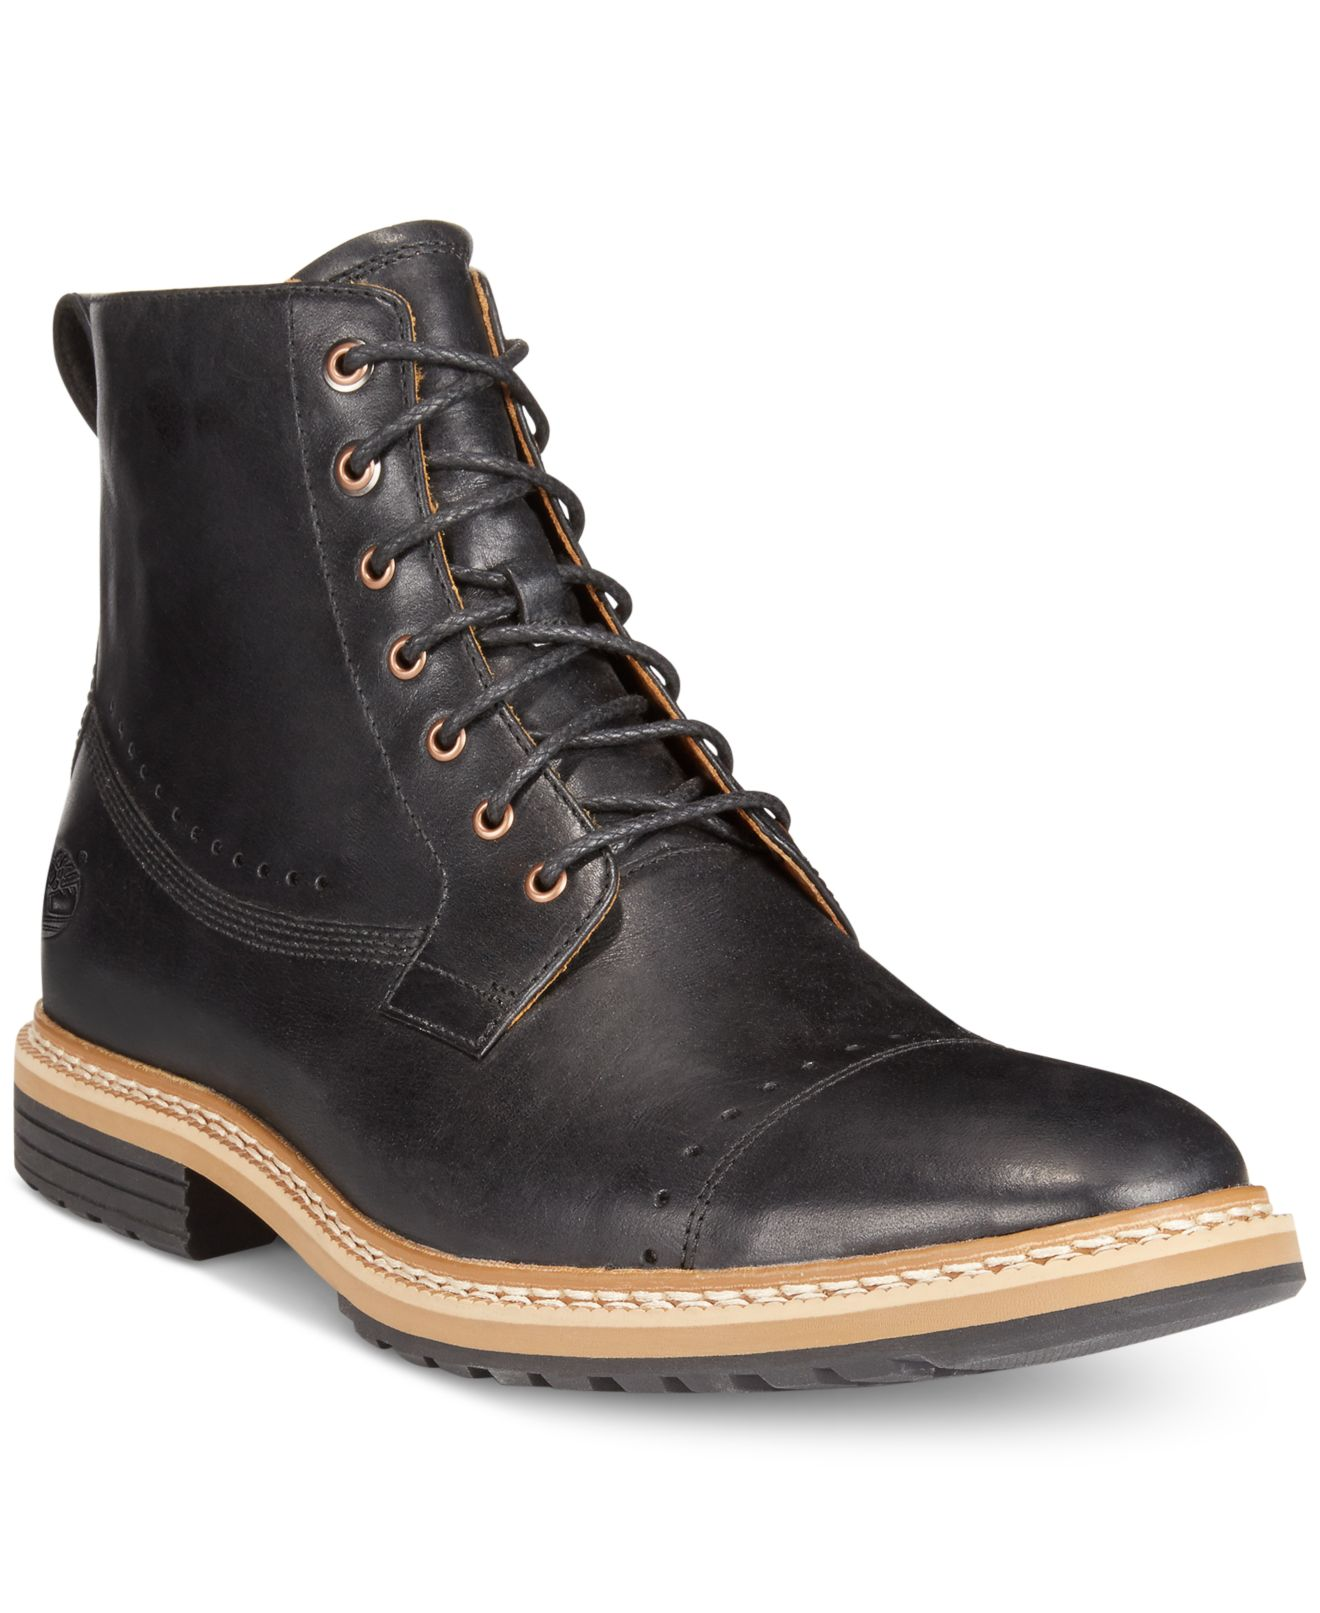 3skb26hs macys mens timberland boots